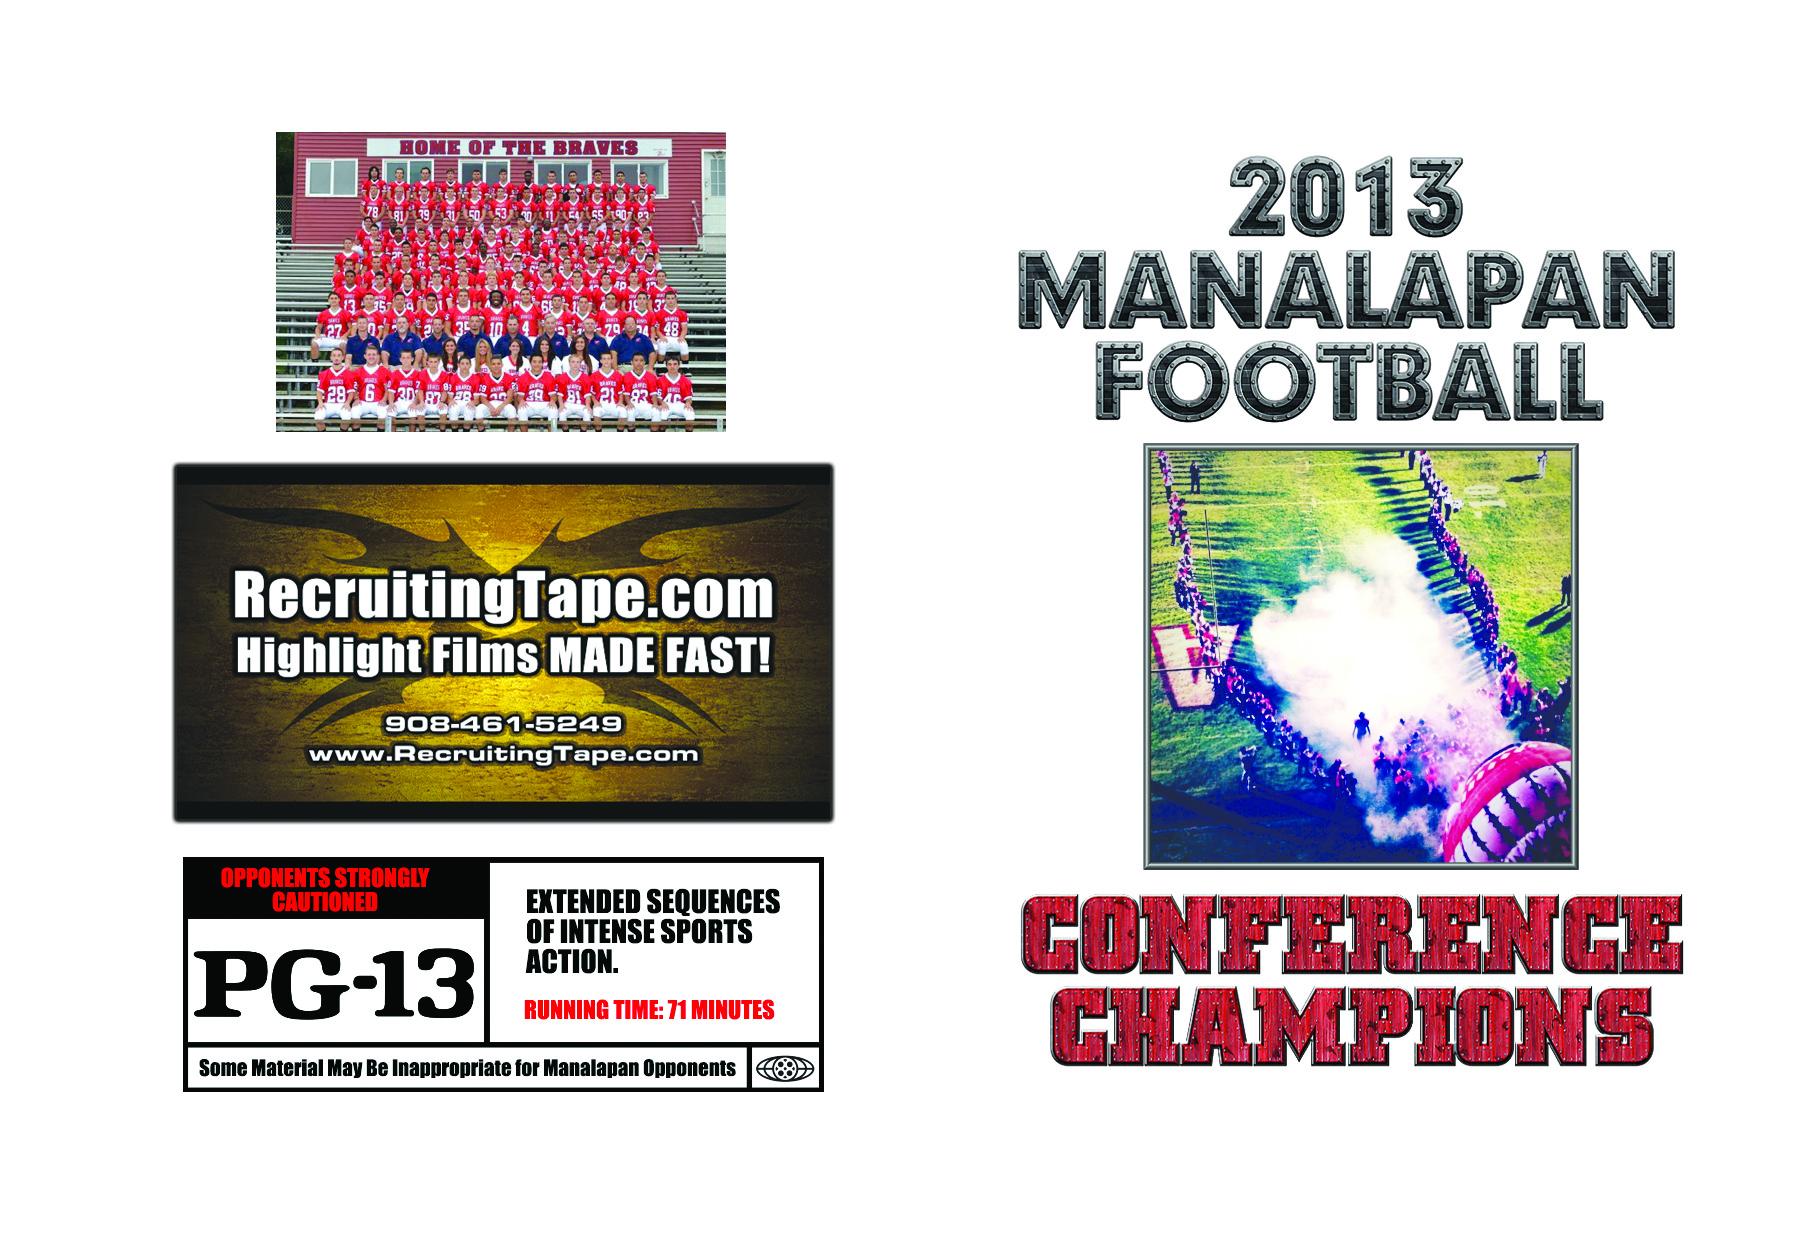 2013 Manalapan Braves Football Highlight Film Football Jacket.jpg